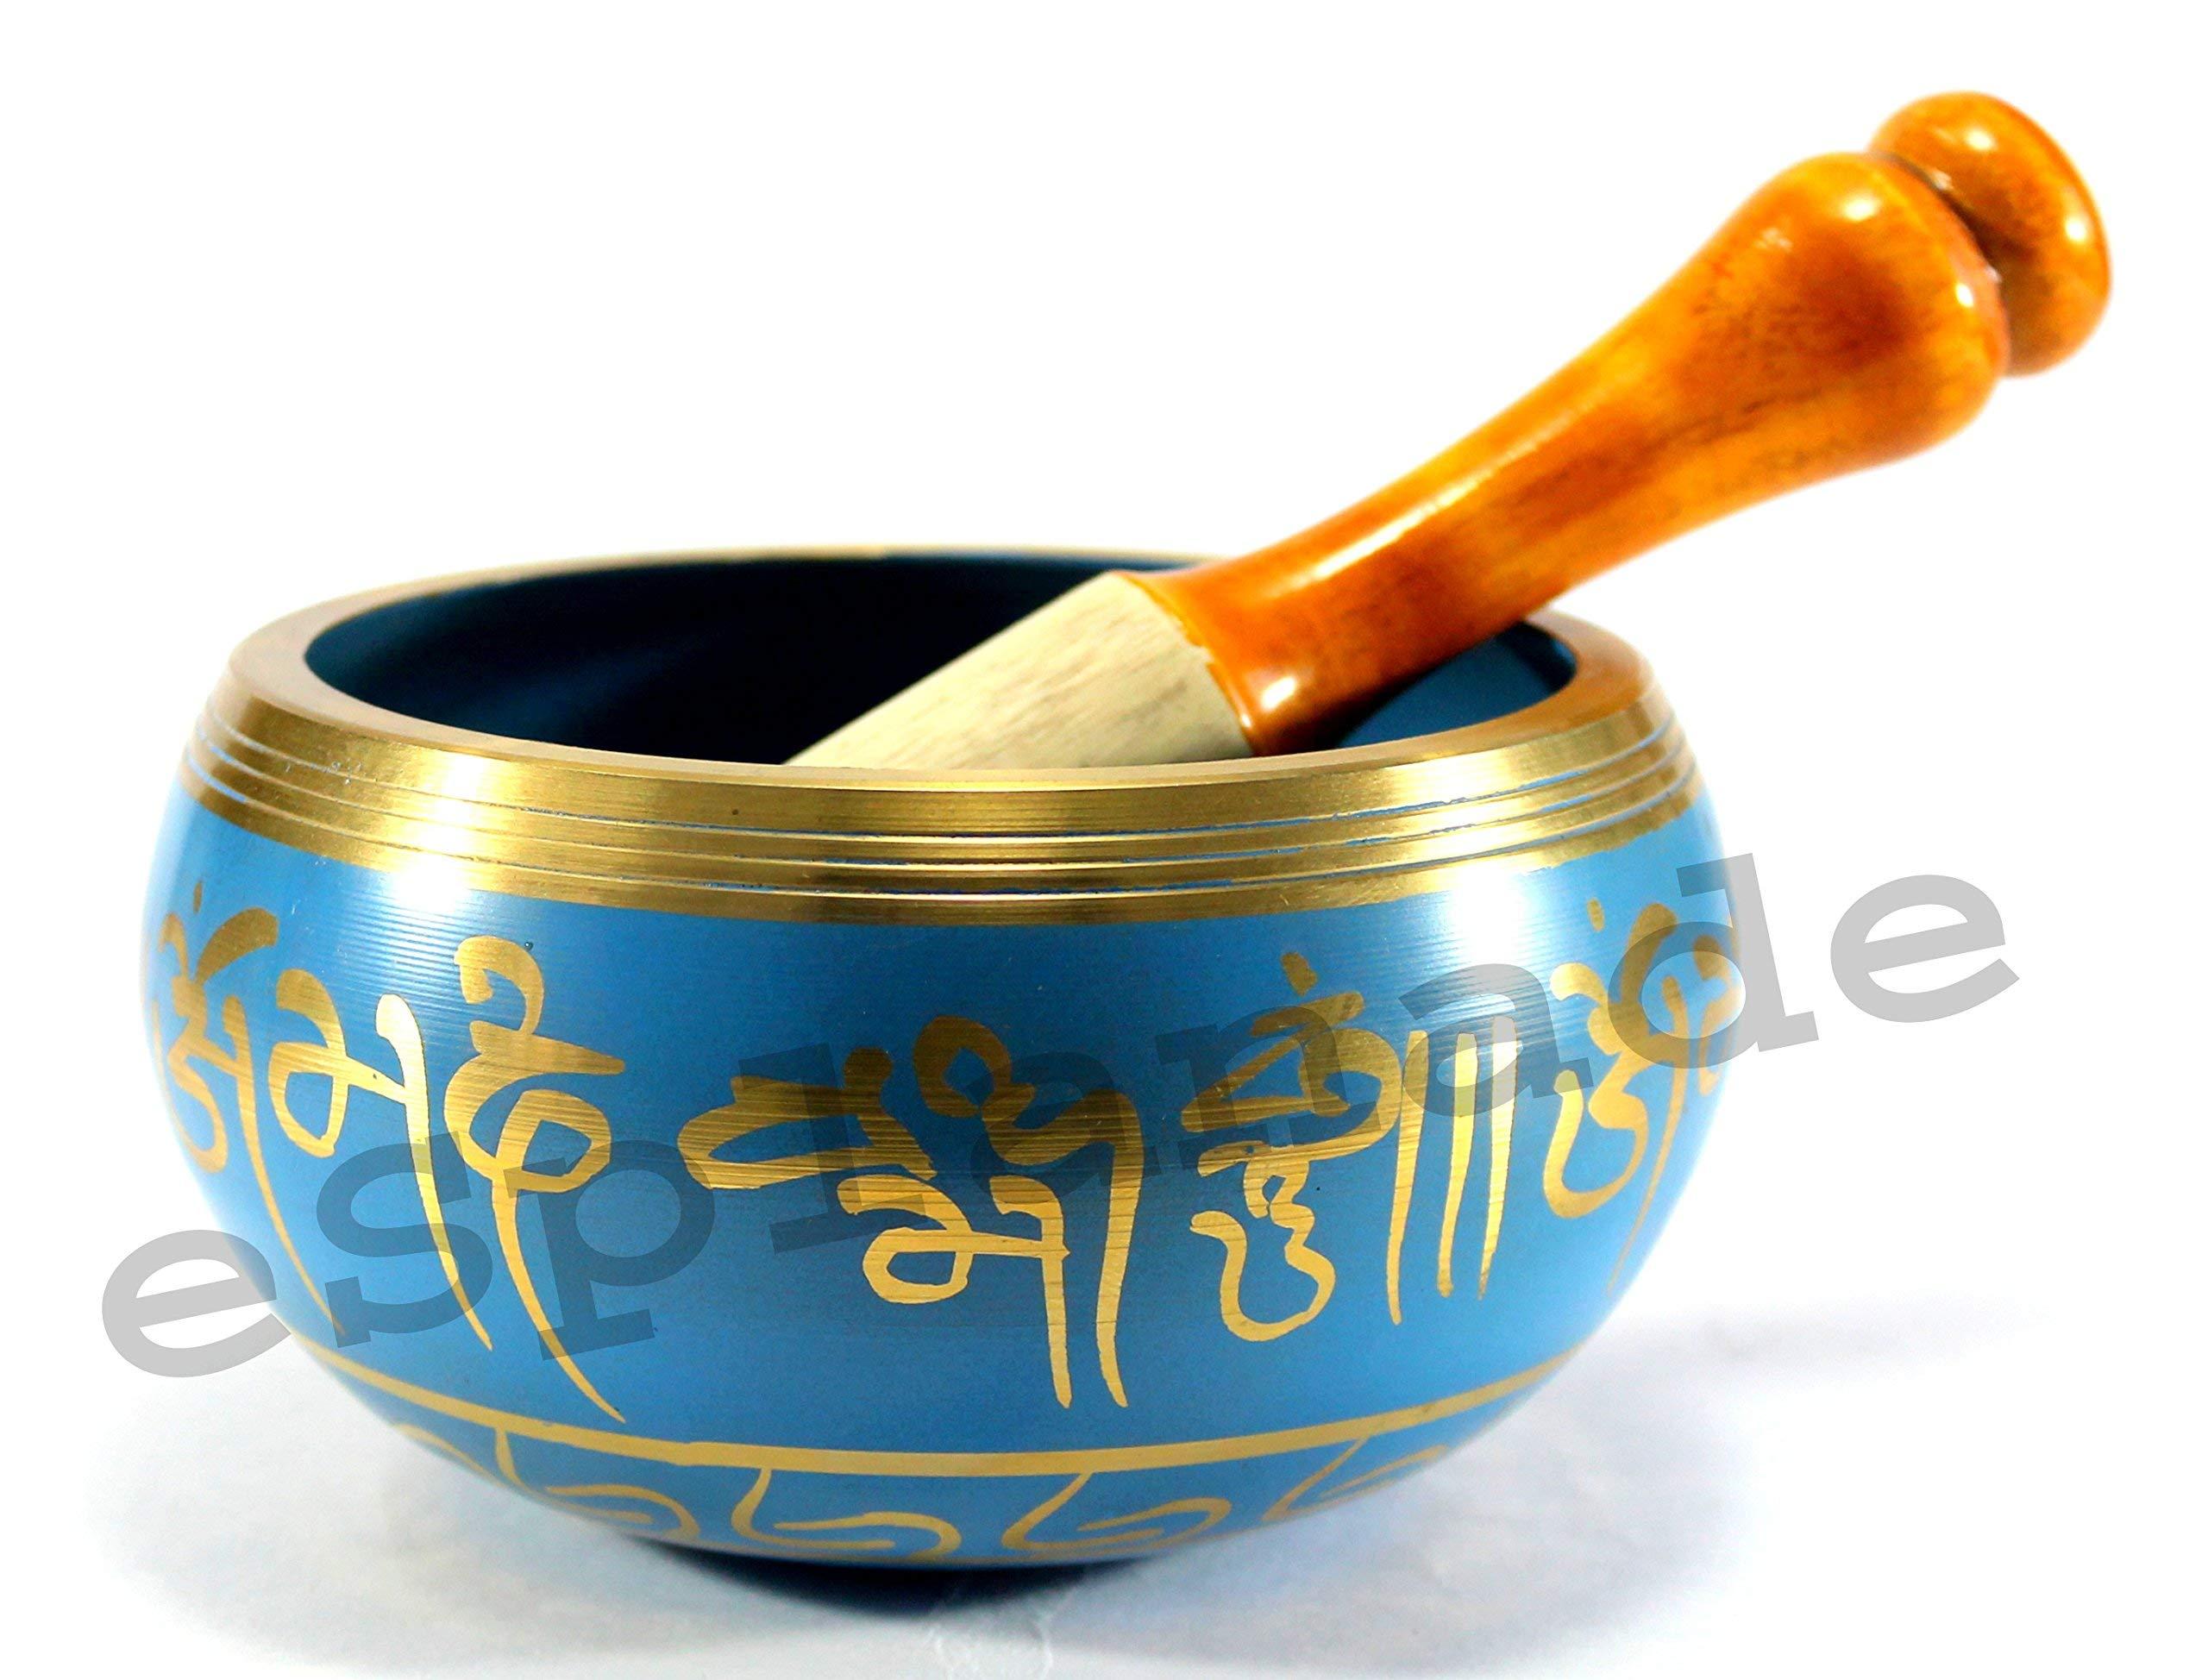 eSplanade - 5 inches - Singing Bowl Tibetan Buddhist Prayer Instrument With Striker Stick   OM Bell   OM Bowl   Meditation Bowl   Music Therapy by eSplanade